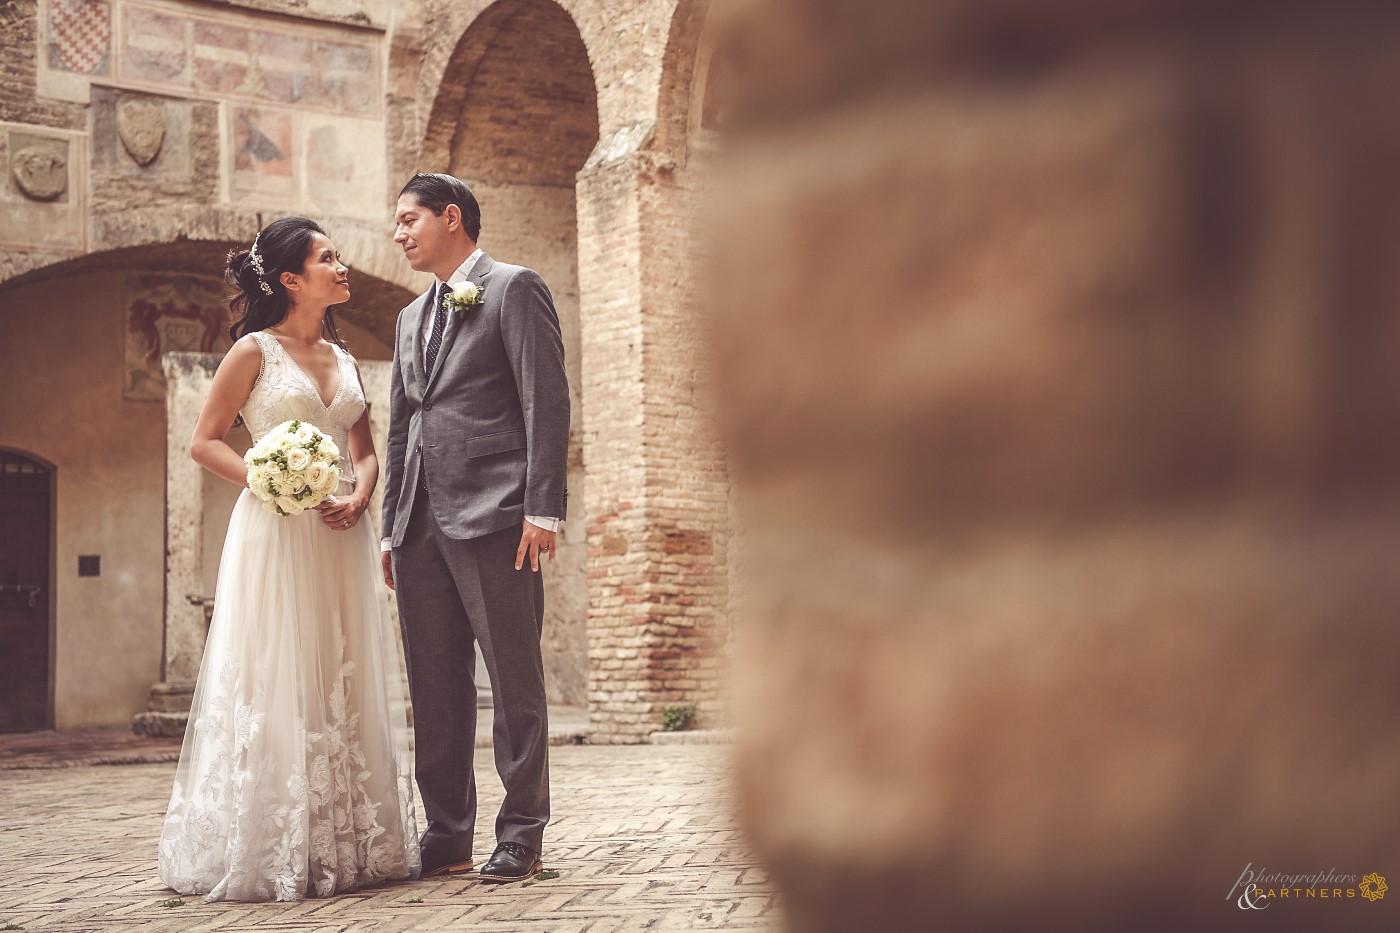 photographers_weddings_siena_22.jpg